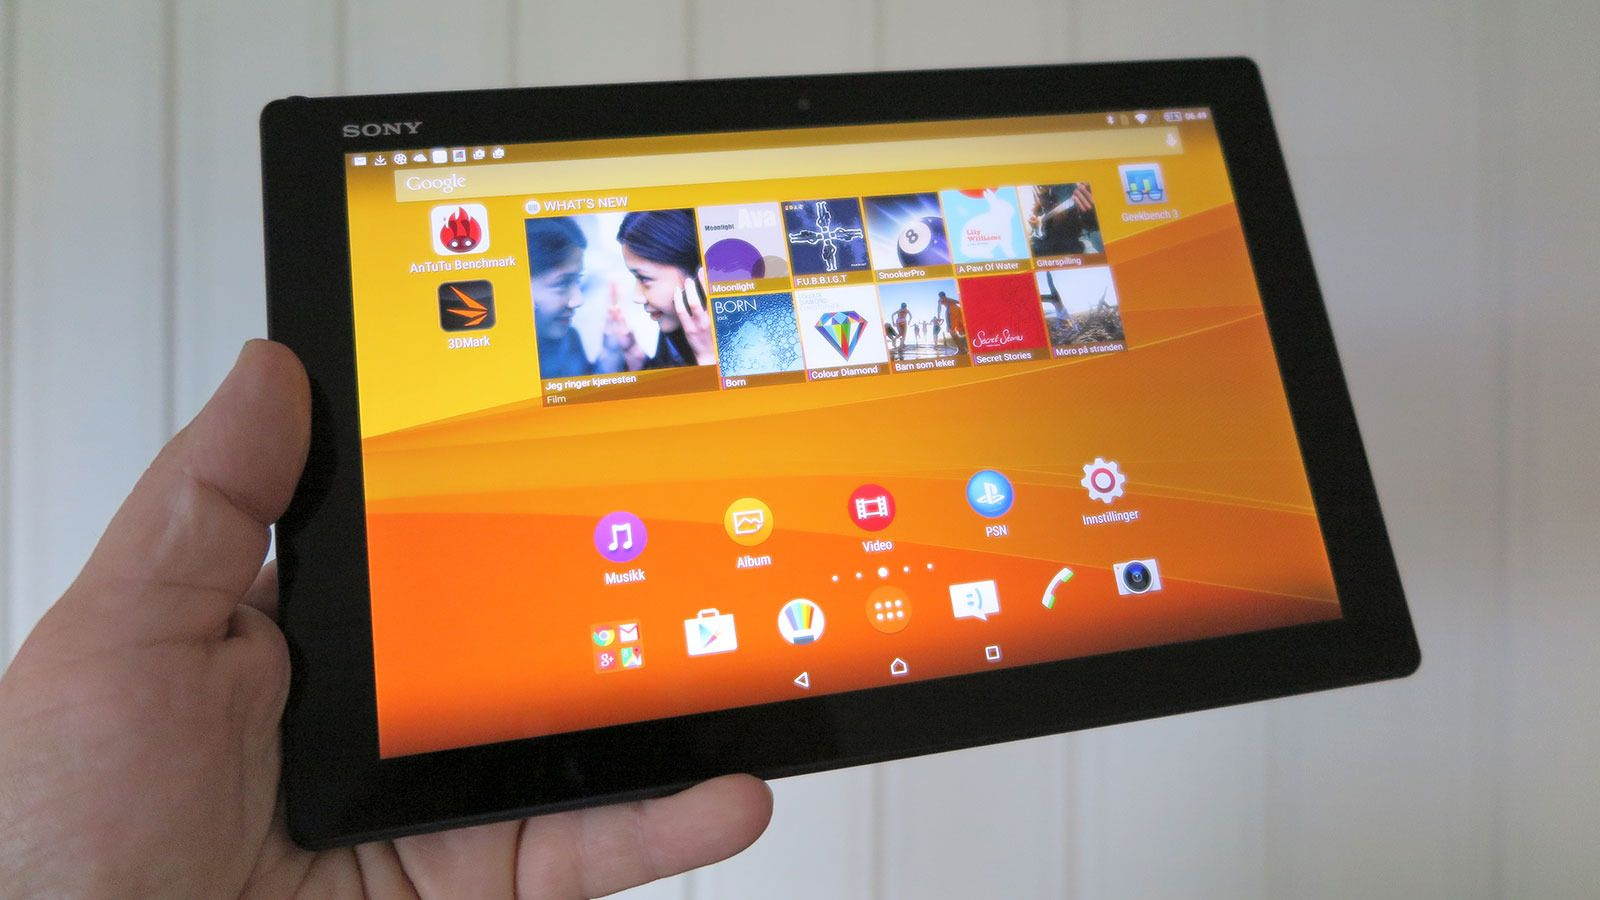 Sony Xperia Z4 Tablet. Foto: Espen Irwing Swang, Tek.no